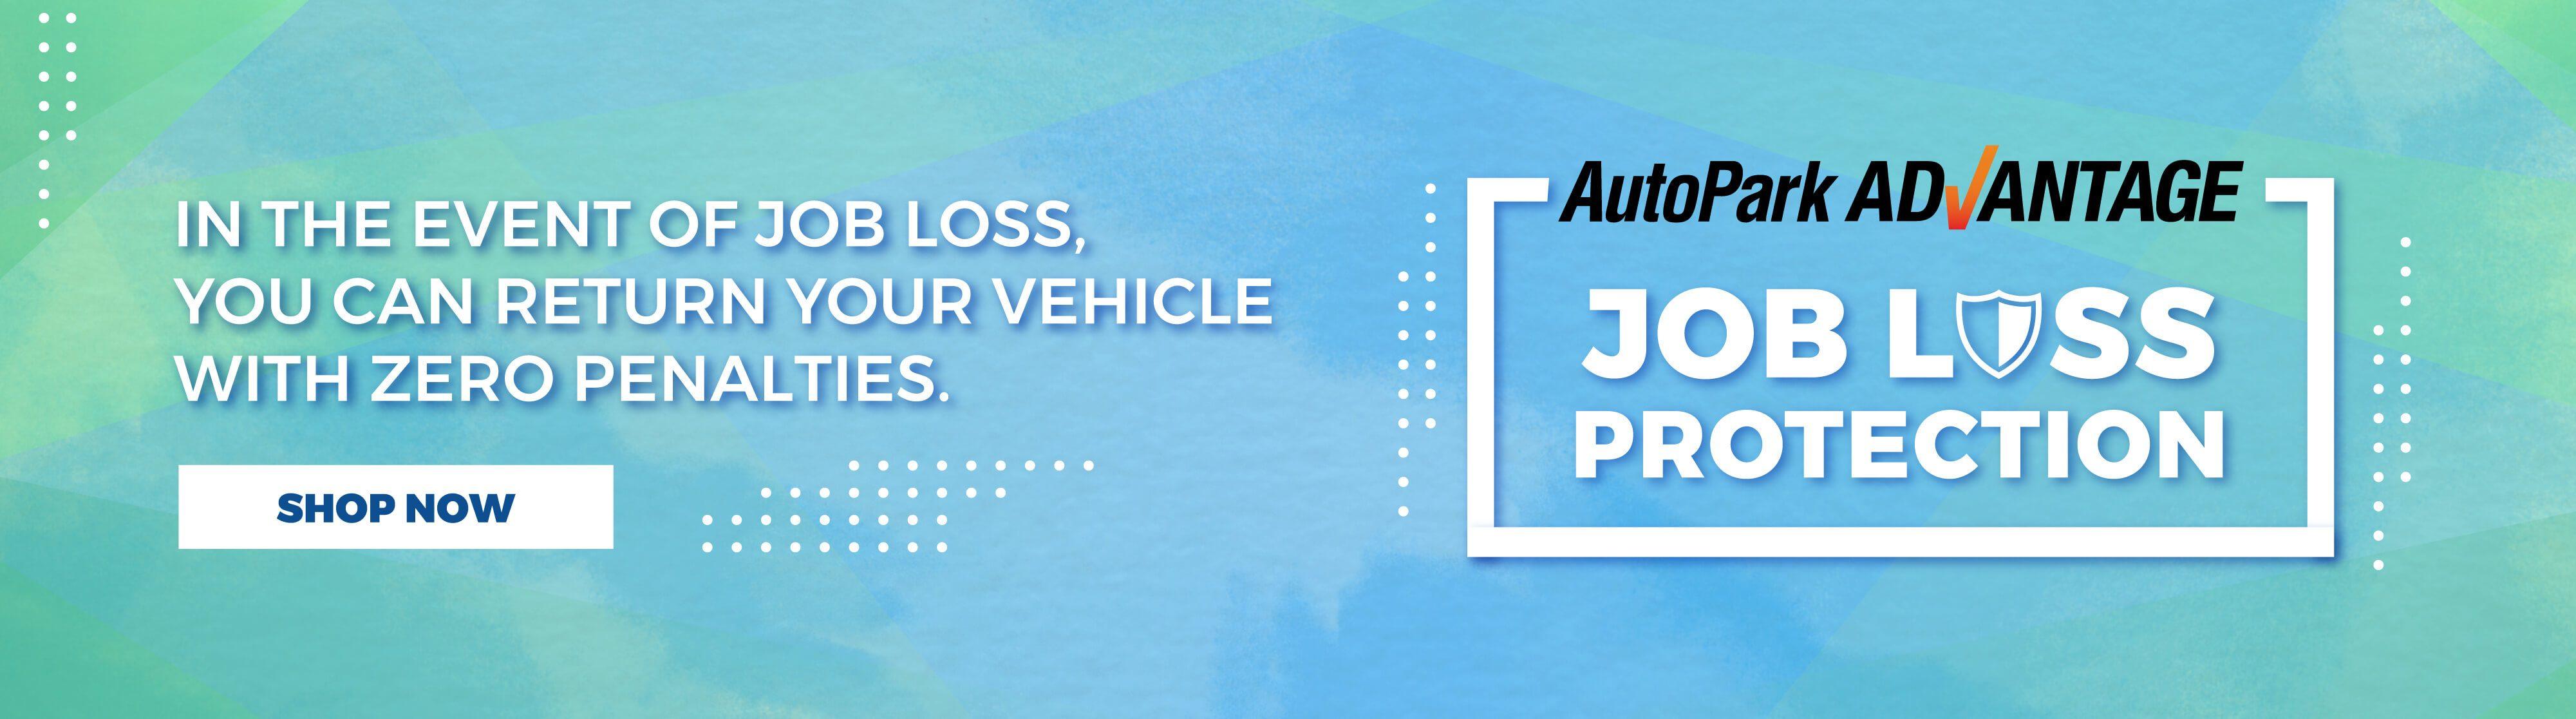 AutoPark - Job Protection Plan